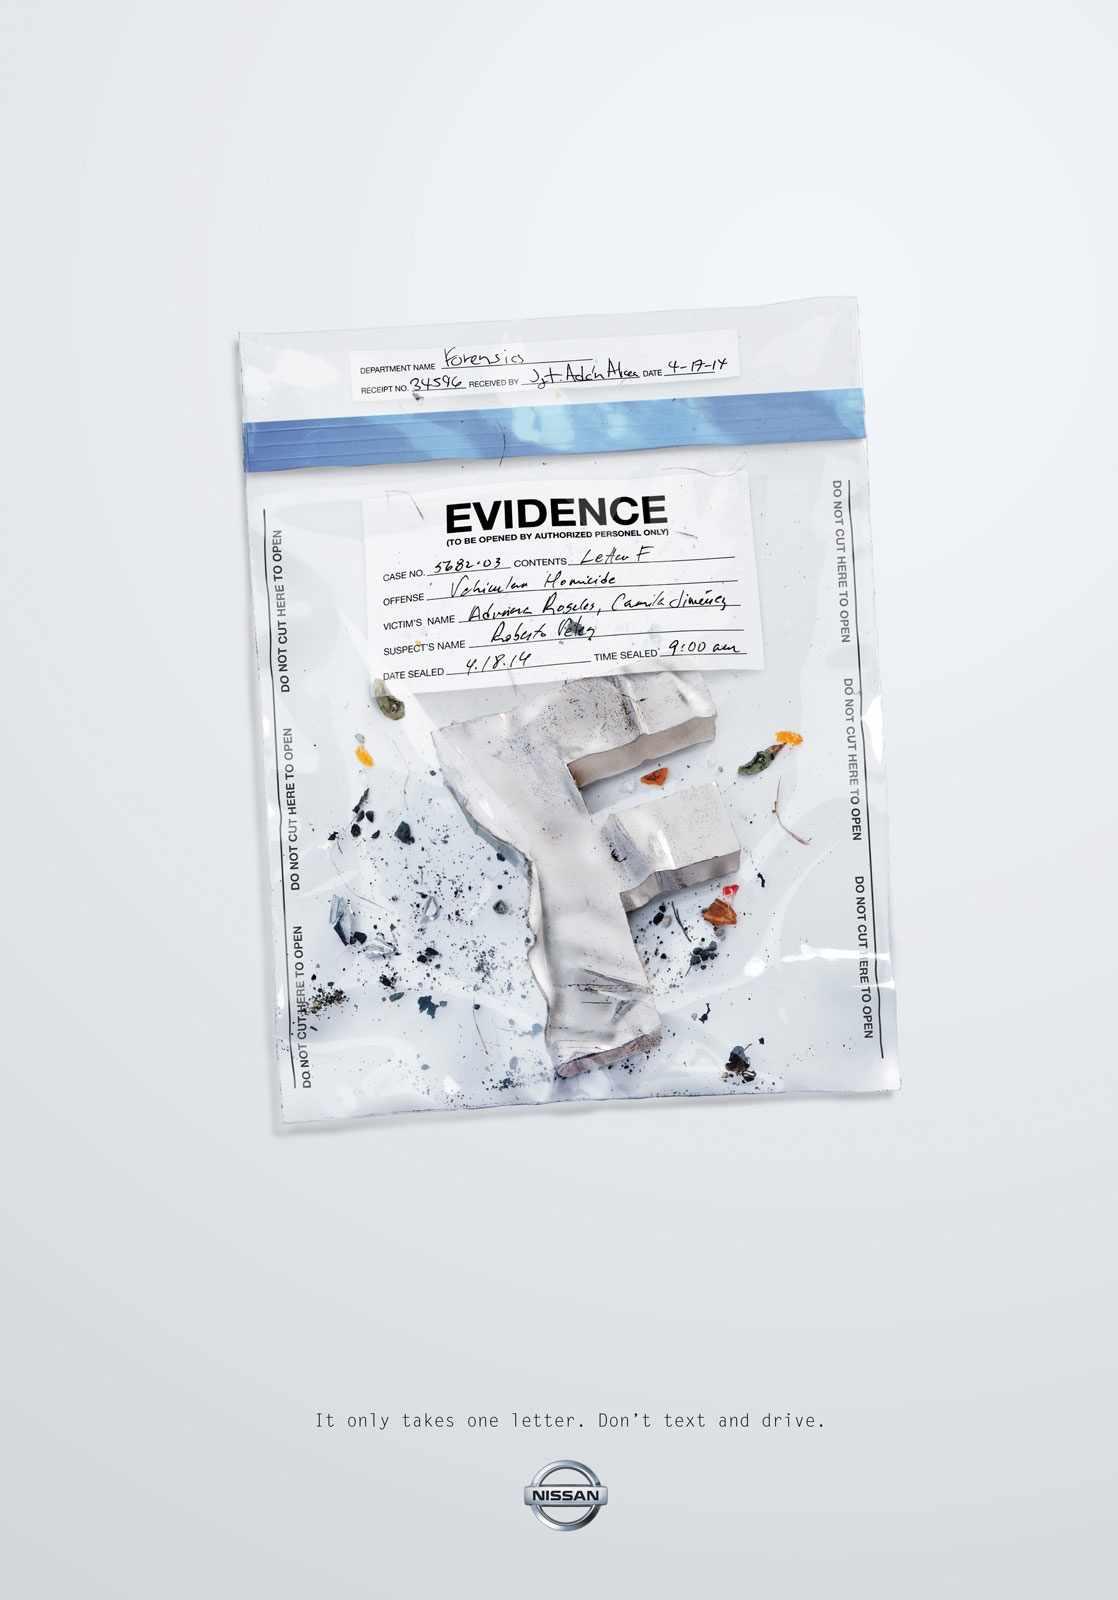 Iklan-Mobil-Nissan-Evidence-F